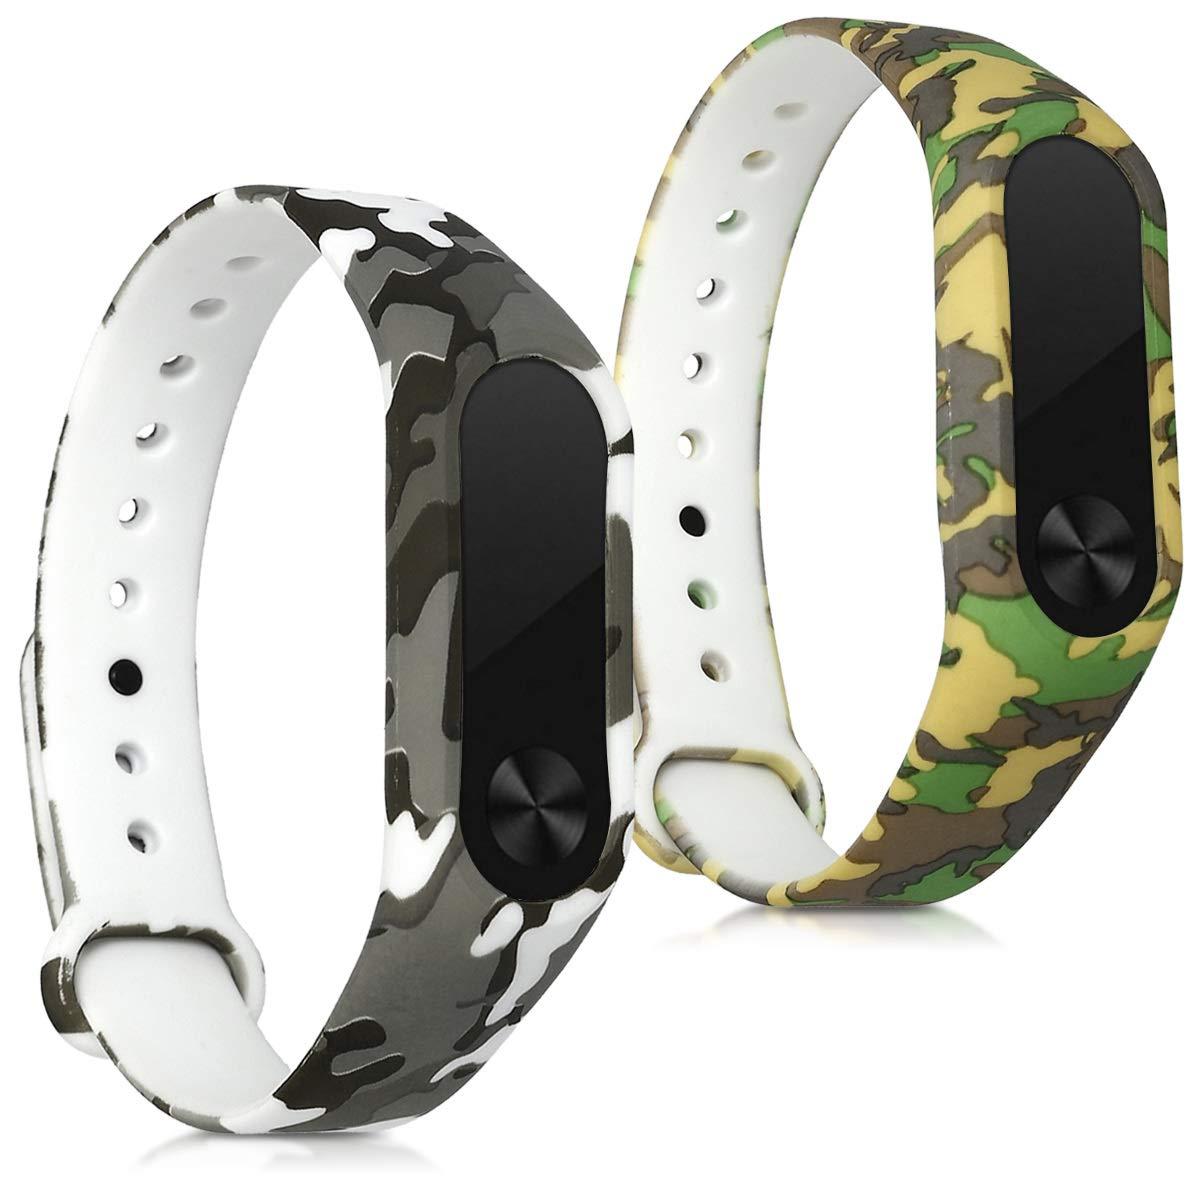 Amazon.com: kwmobile Silicone Watch Strap for Xiaomi Mi Band ...